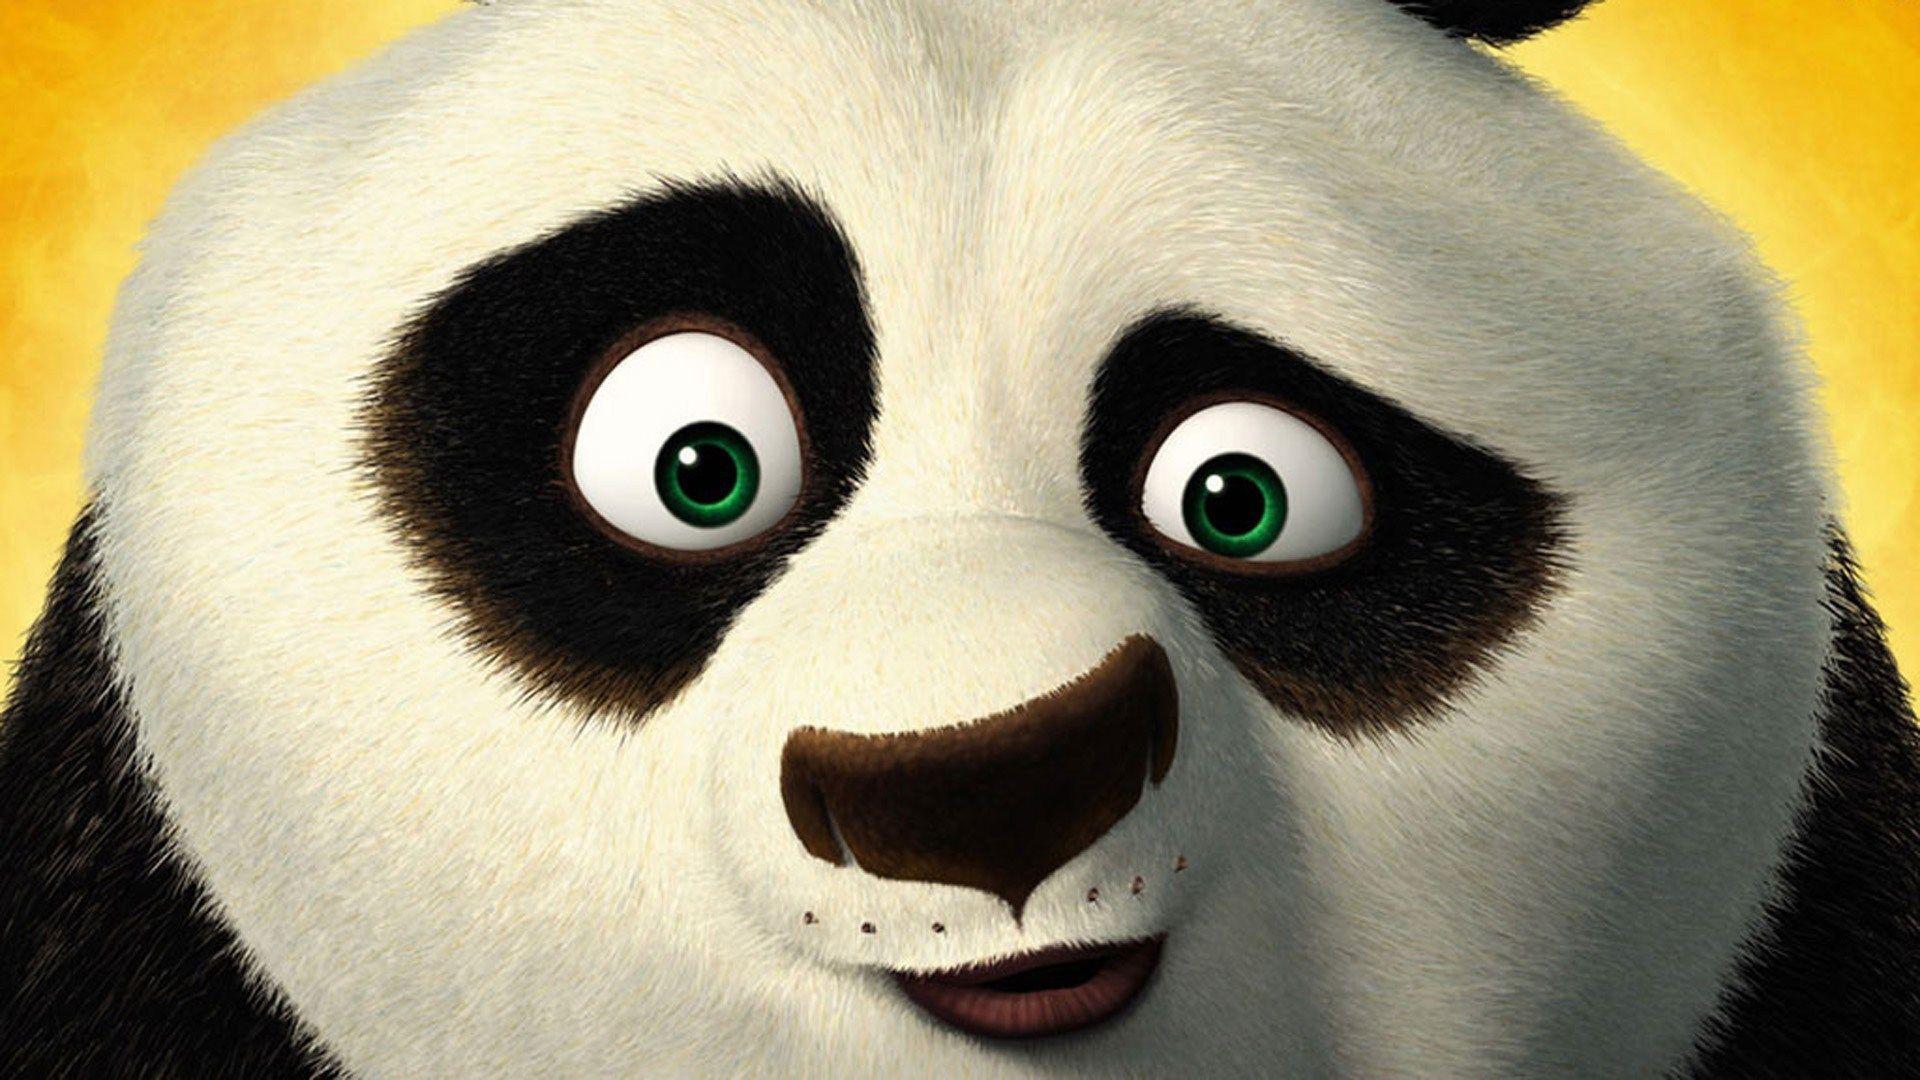 Cool Panda Wallpapers - Top Free Cool Panda Backgrounds ...